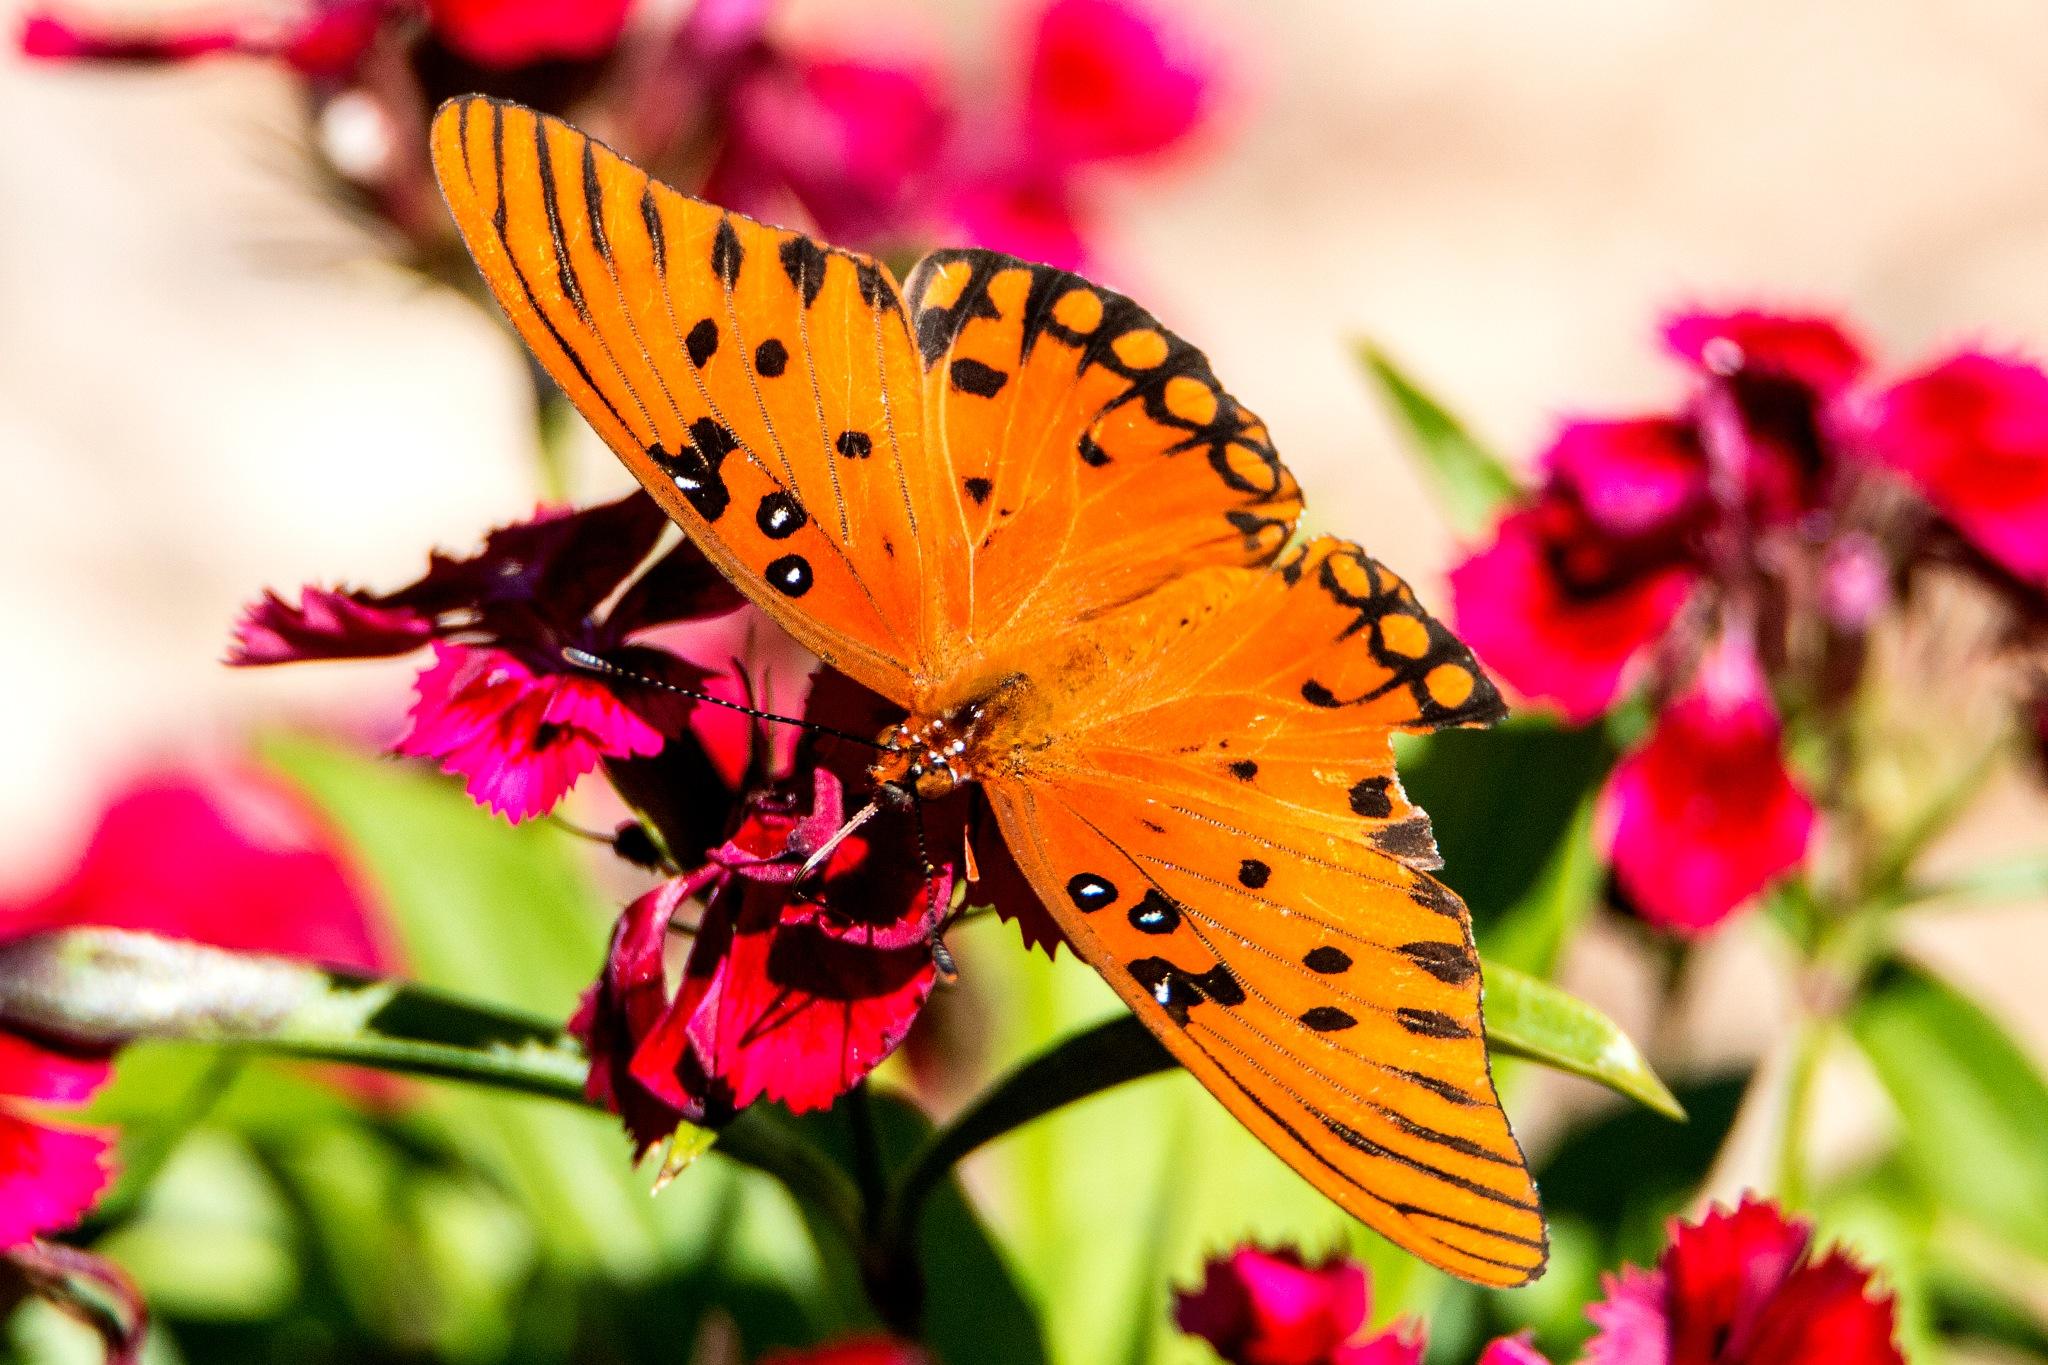 Gulf Fritillary Butterfly by Manny Obordo